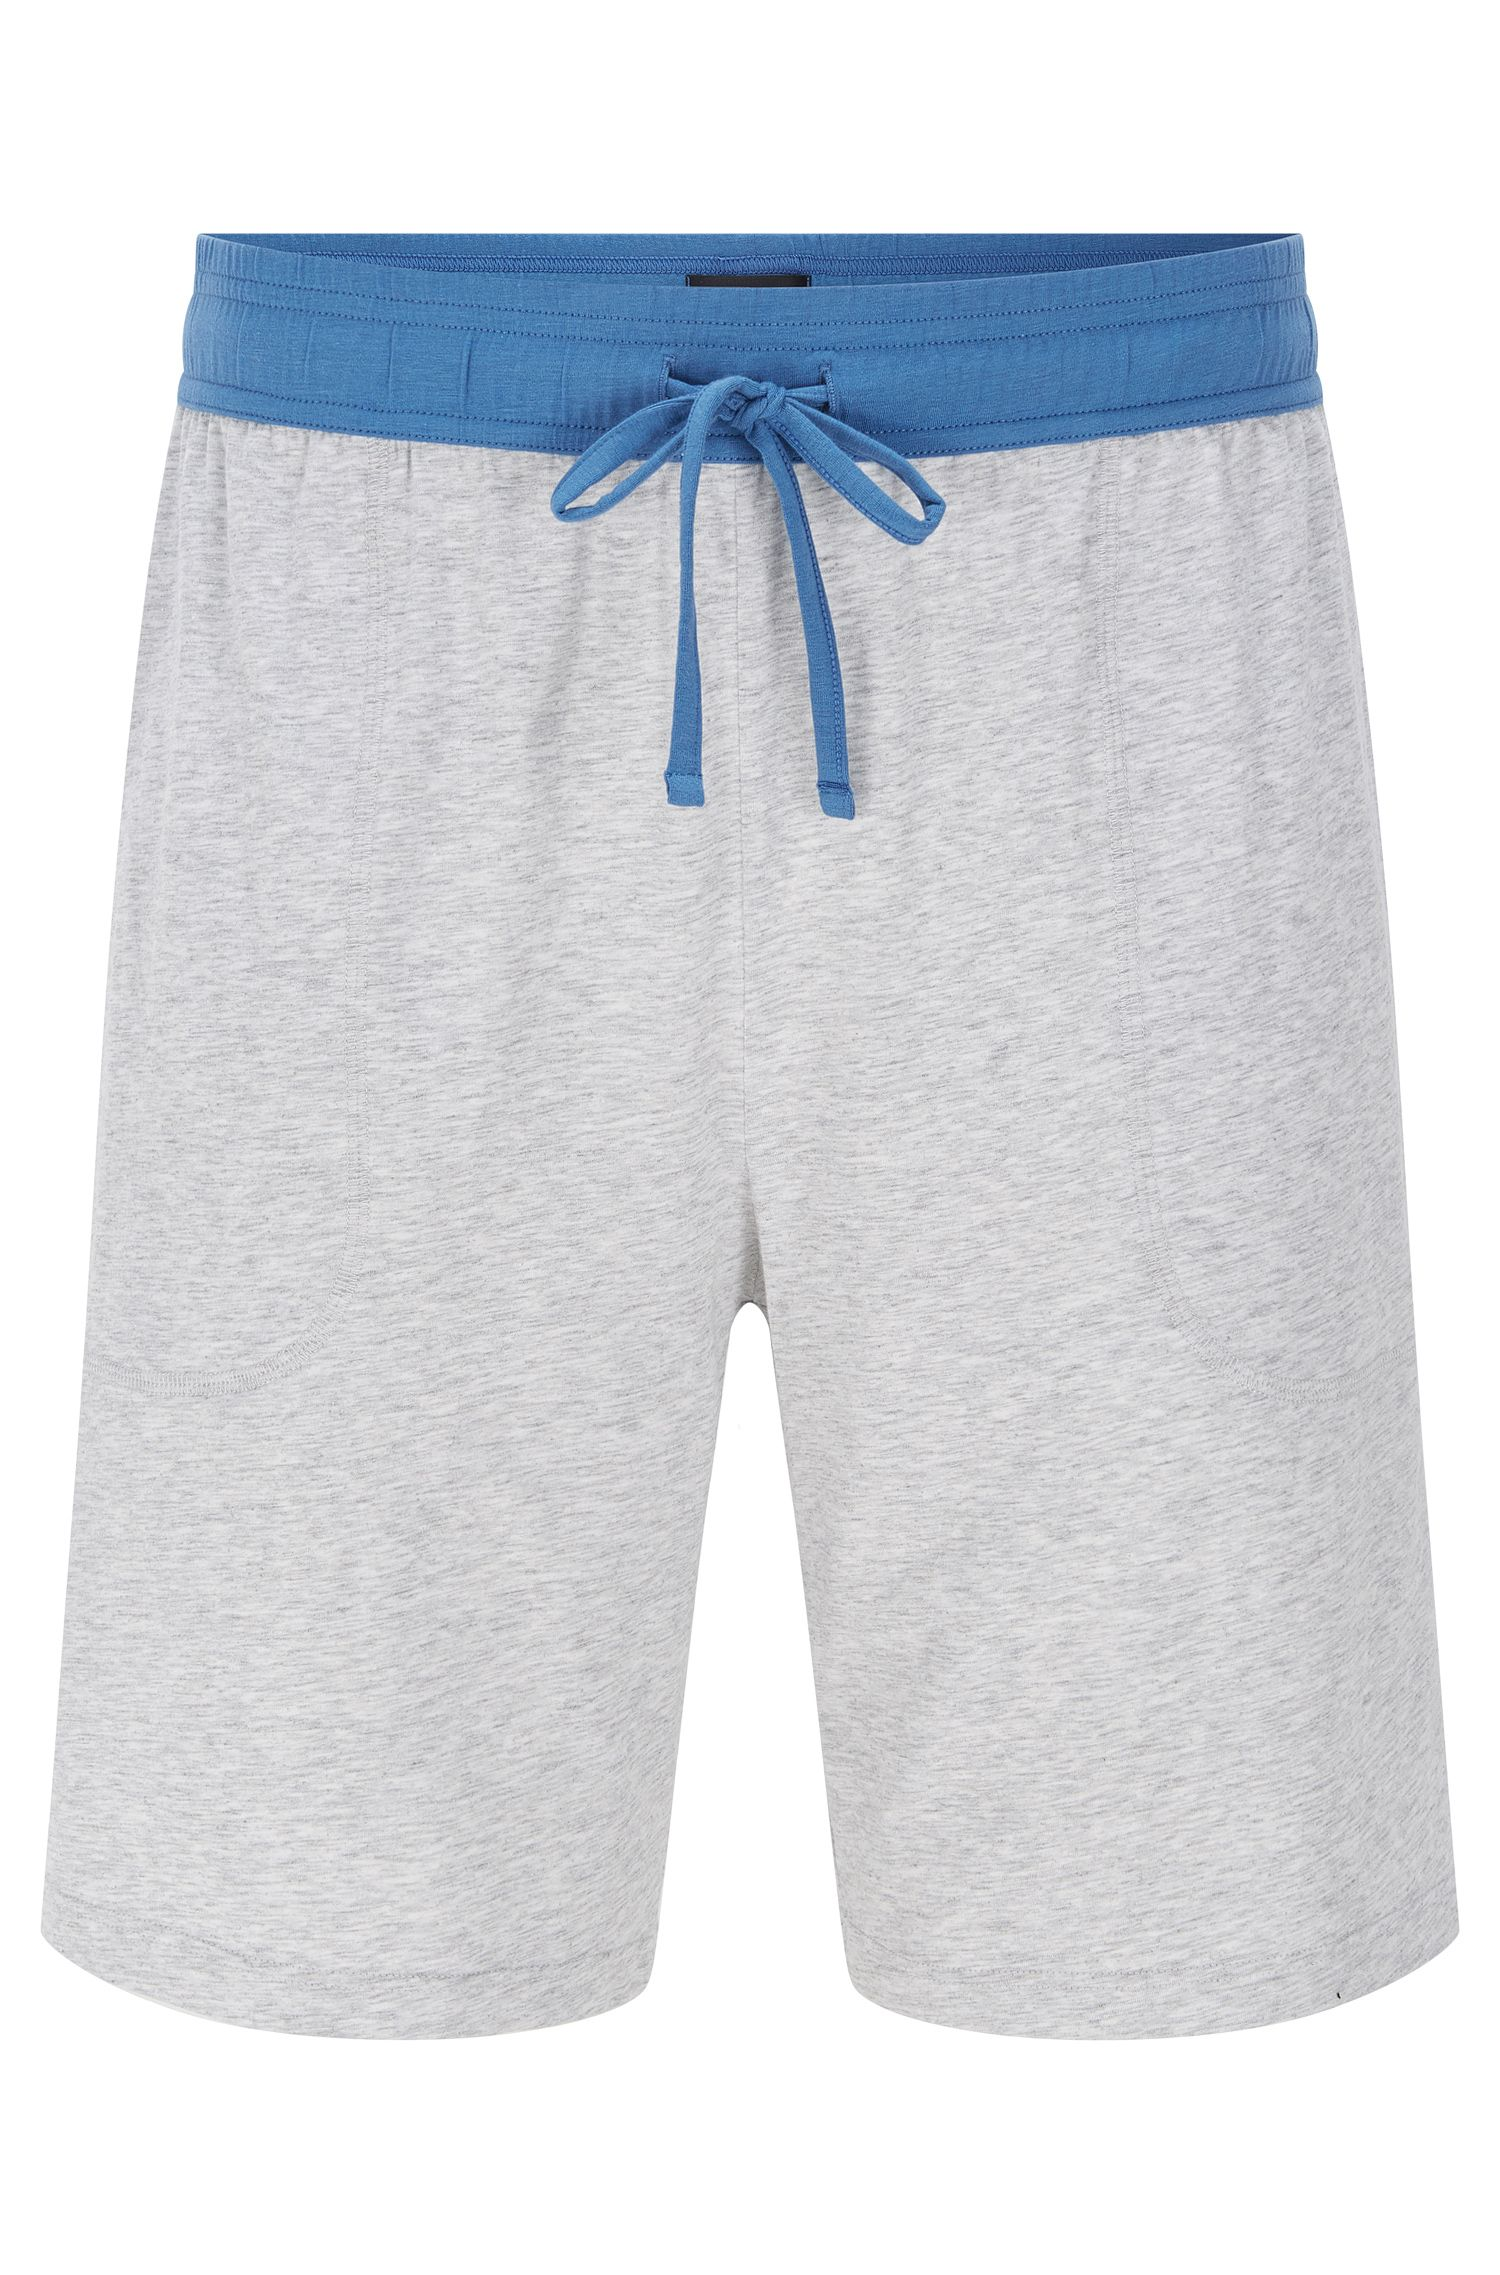 Pantalón corto de pijama en mezcla de algodón elástico con modal: 'Short Pant CW'